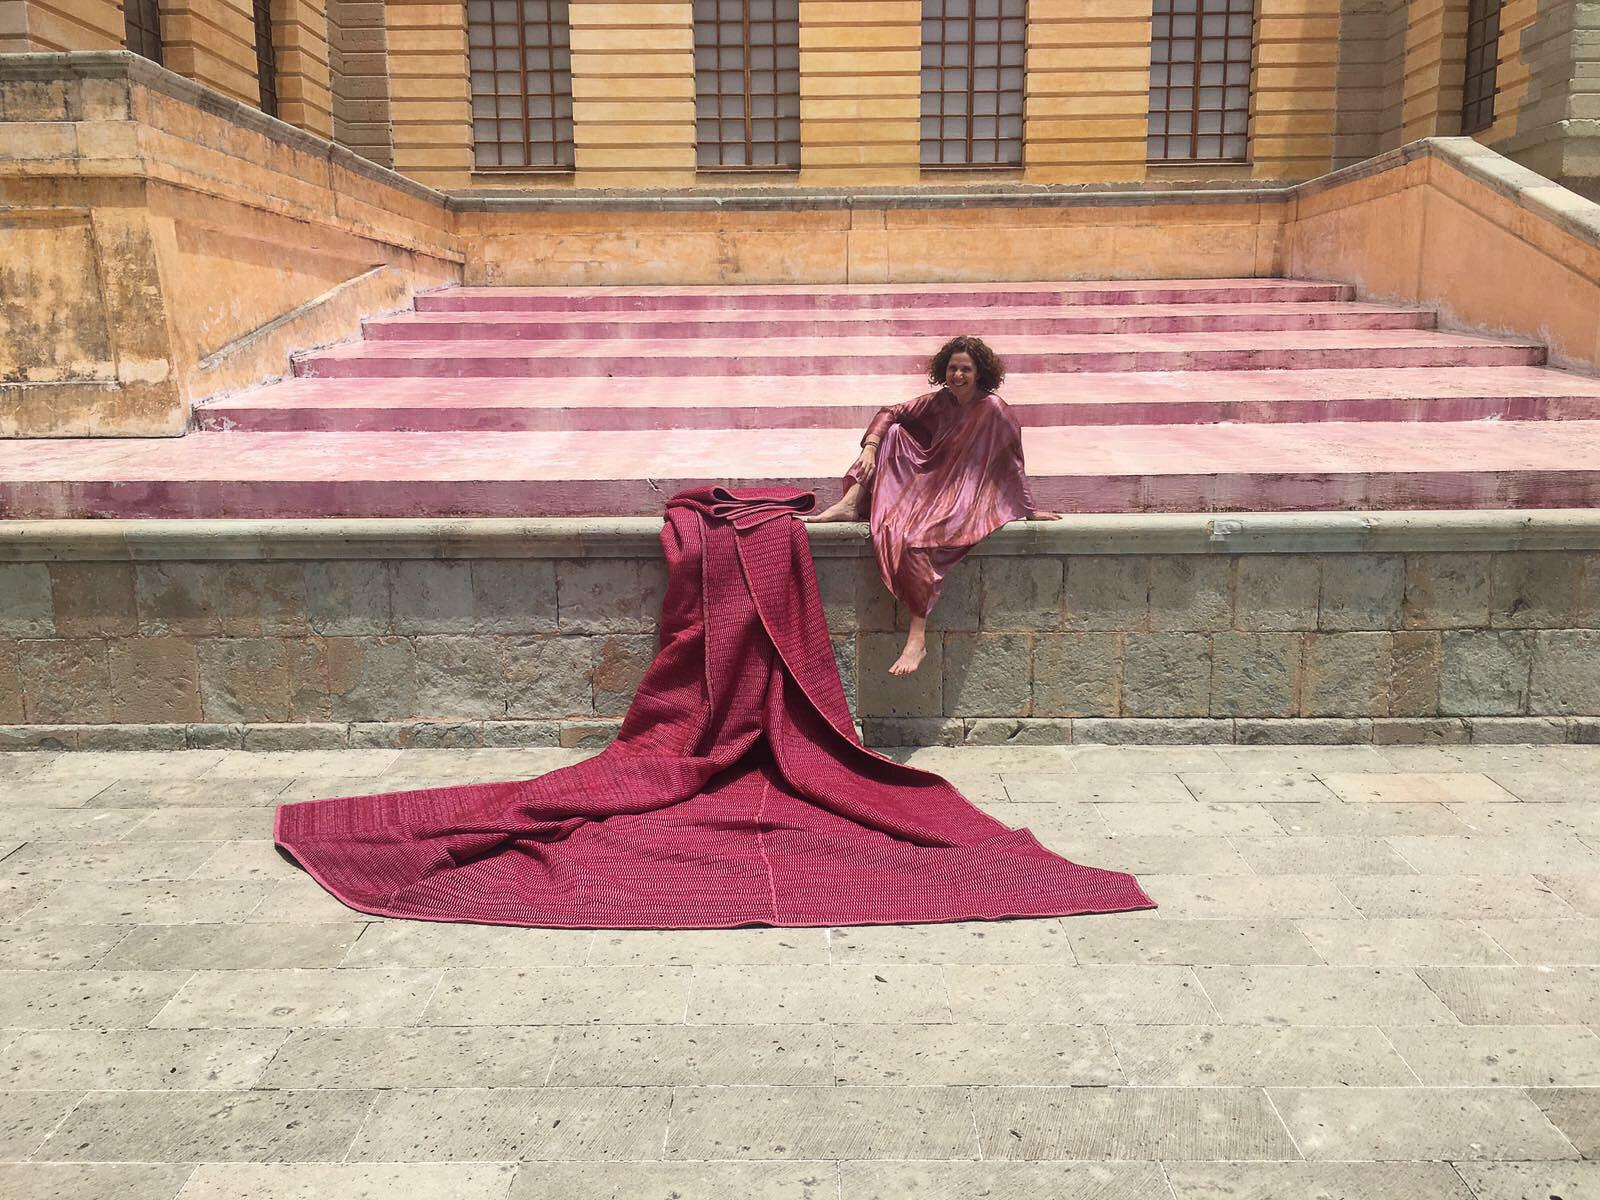 Maddalena Forcella artist and co-founder of Madda Studio